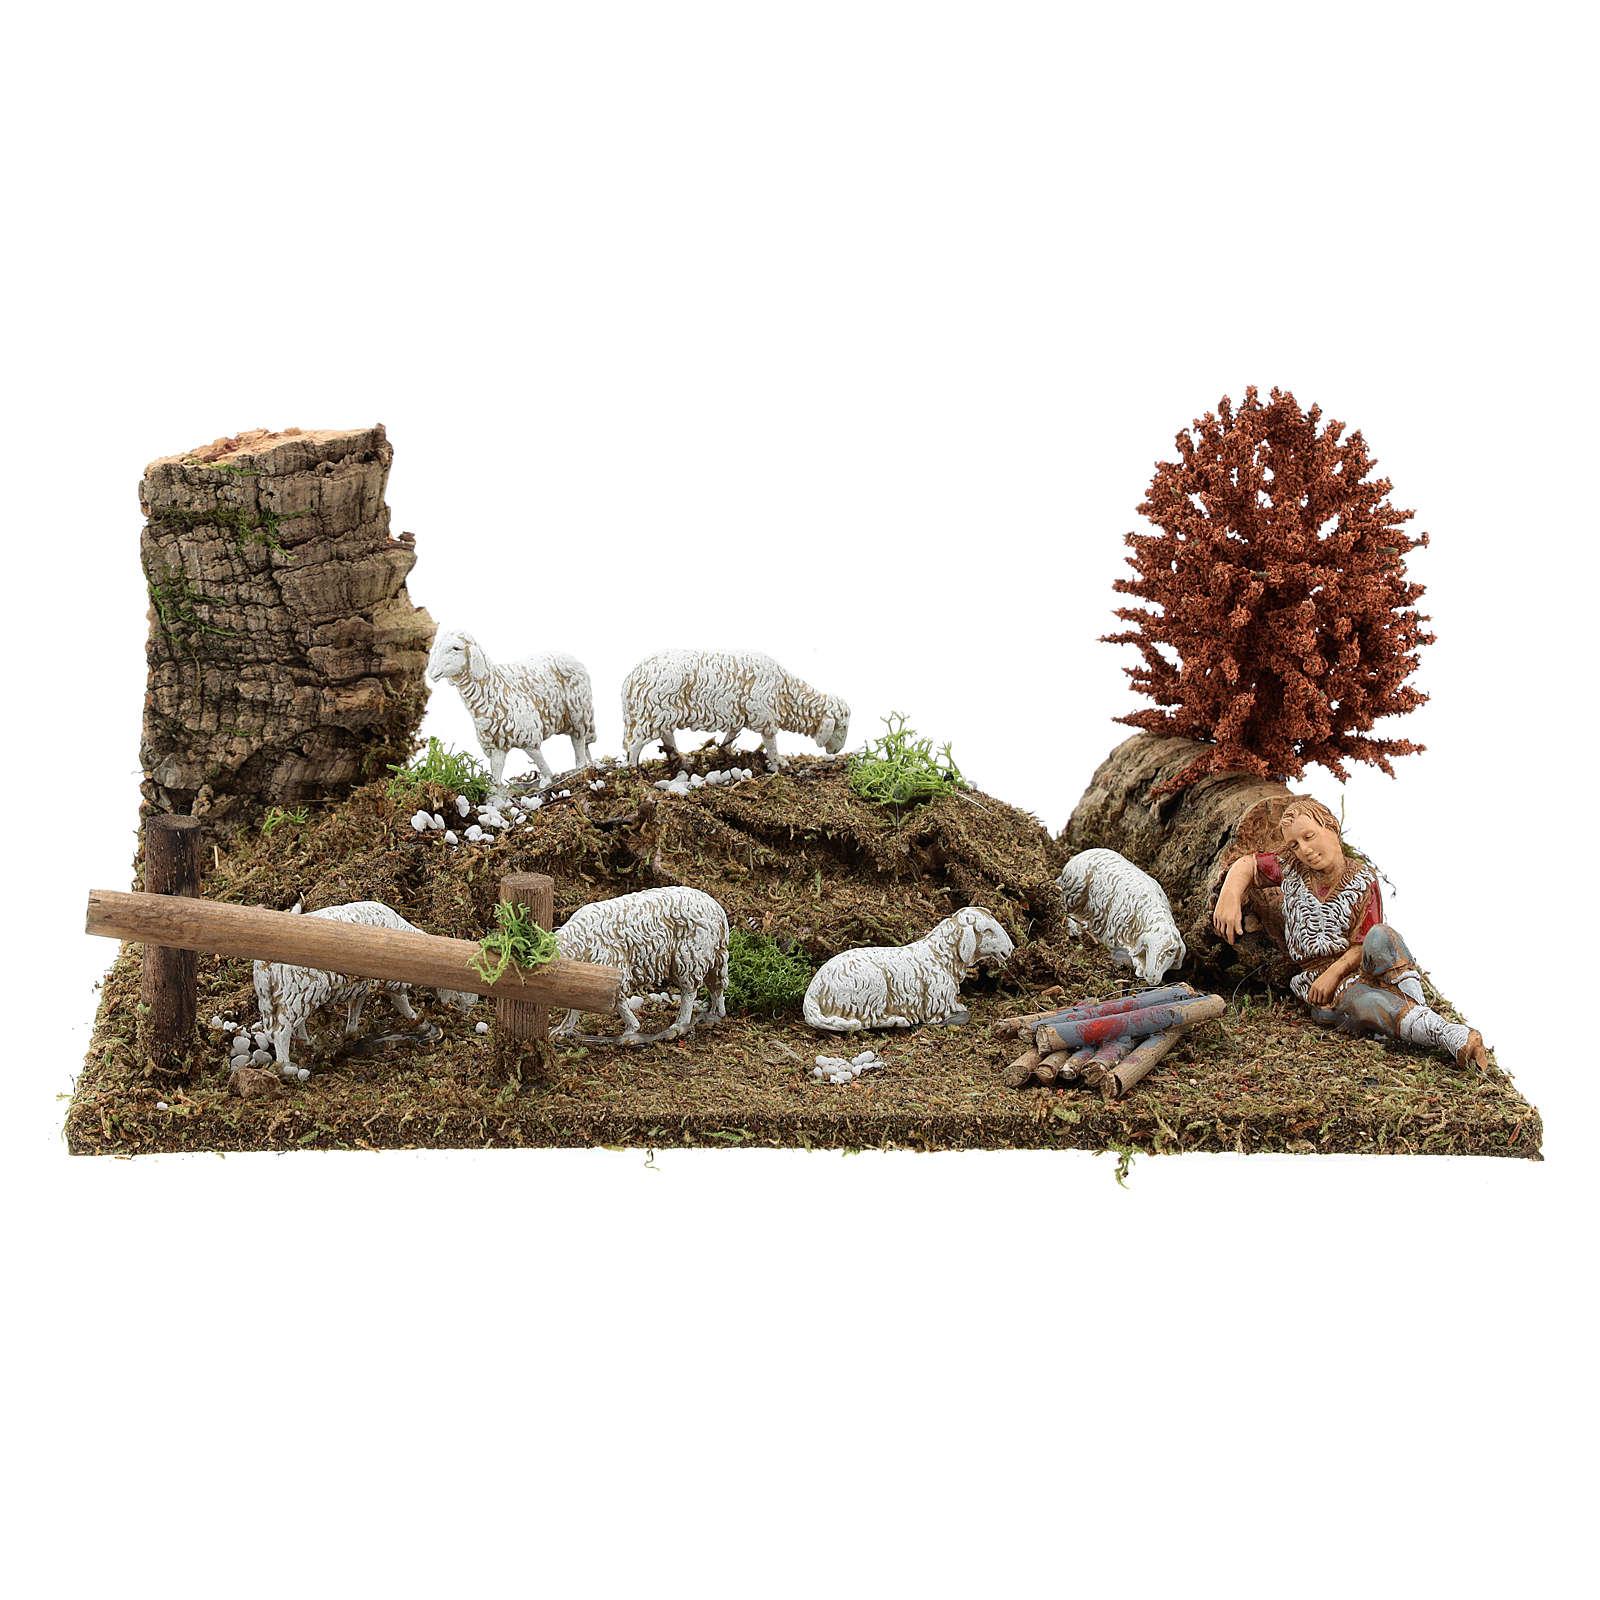 Sleeping shepherd with sheep 8-10 cm, Nativity Scene setting with tree 15x30x20 3